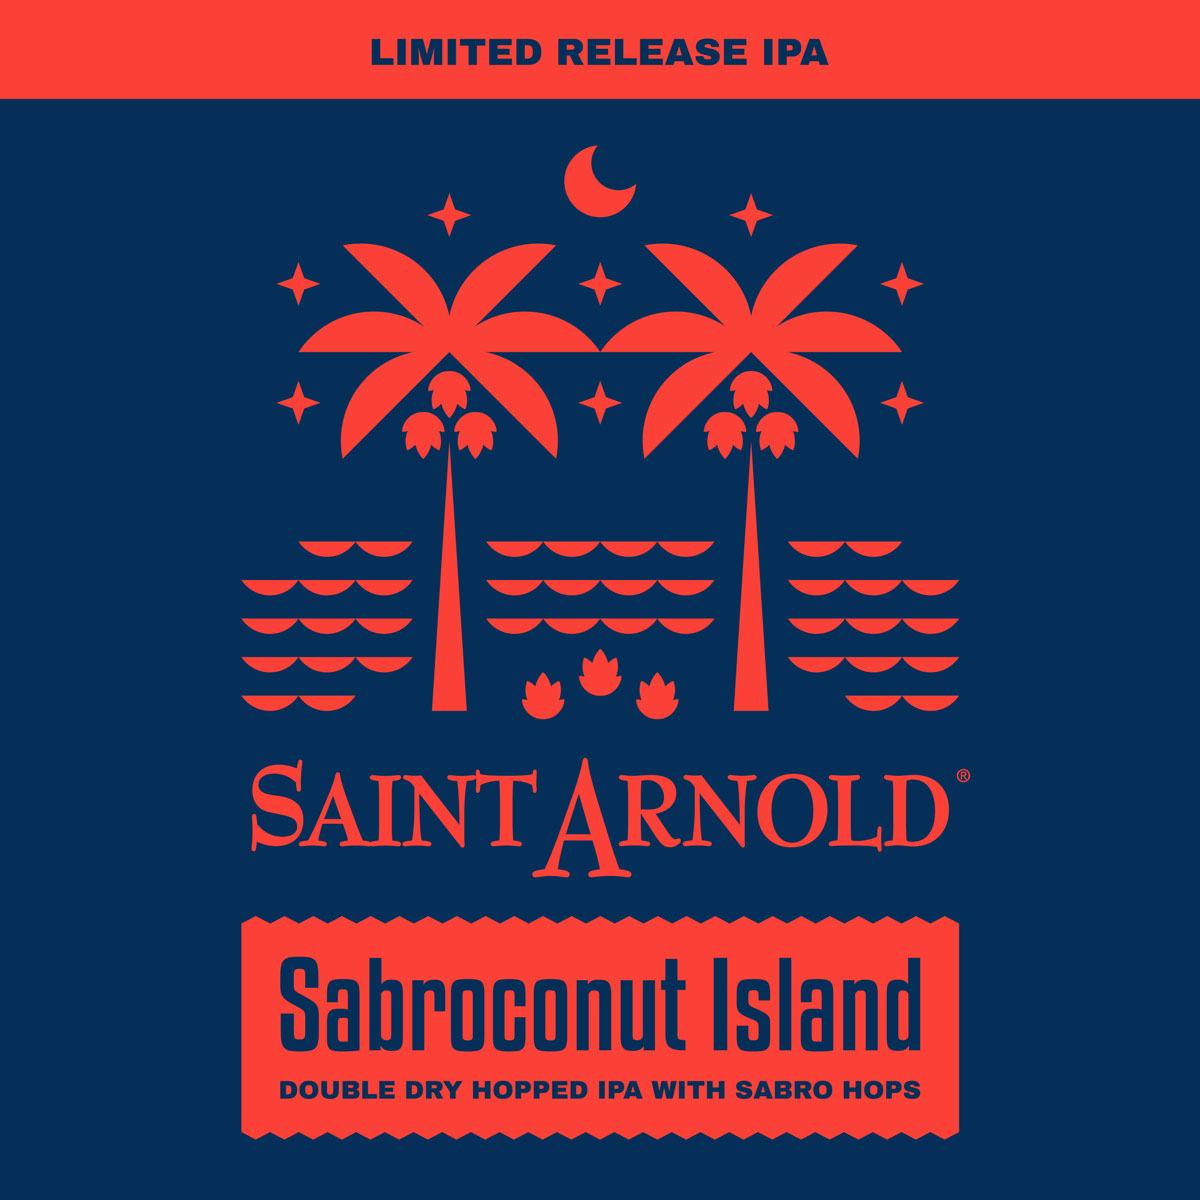 brand_image_sabroconut_island